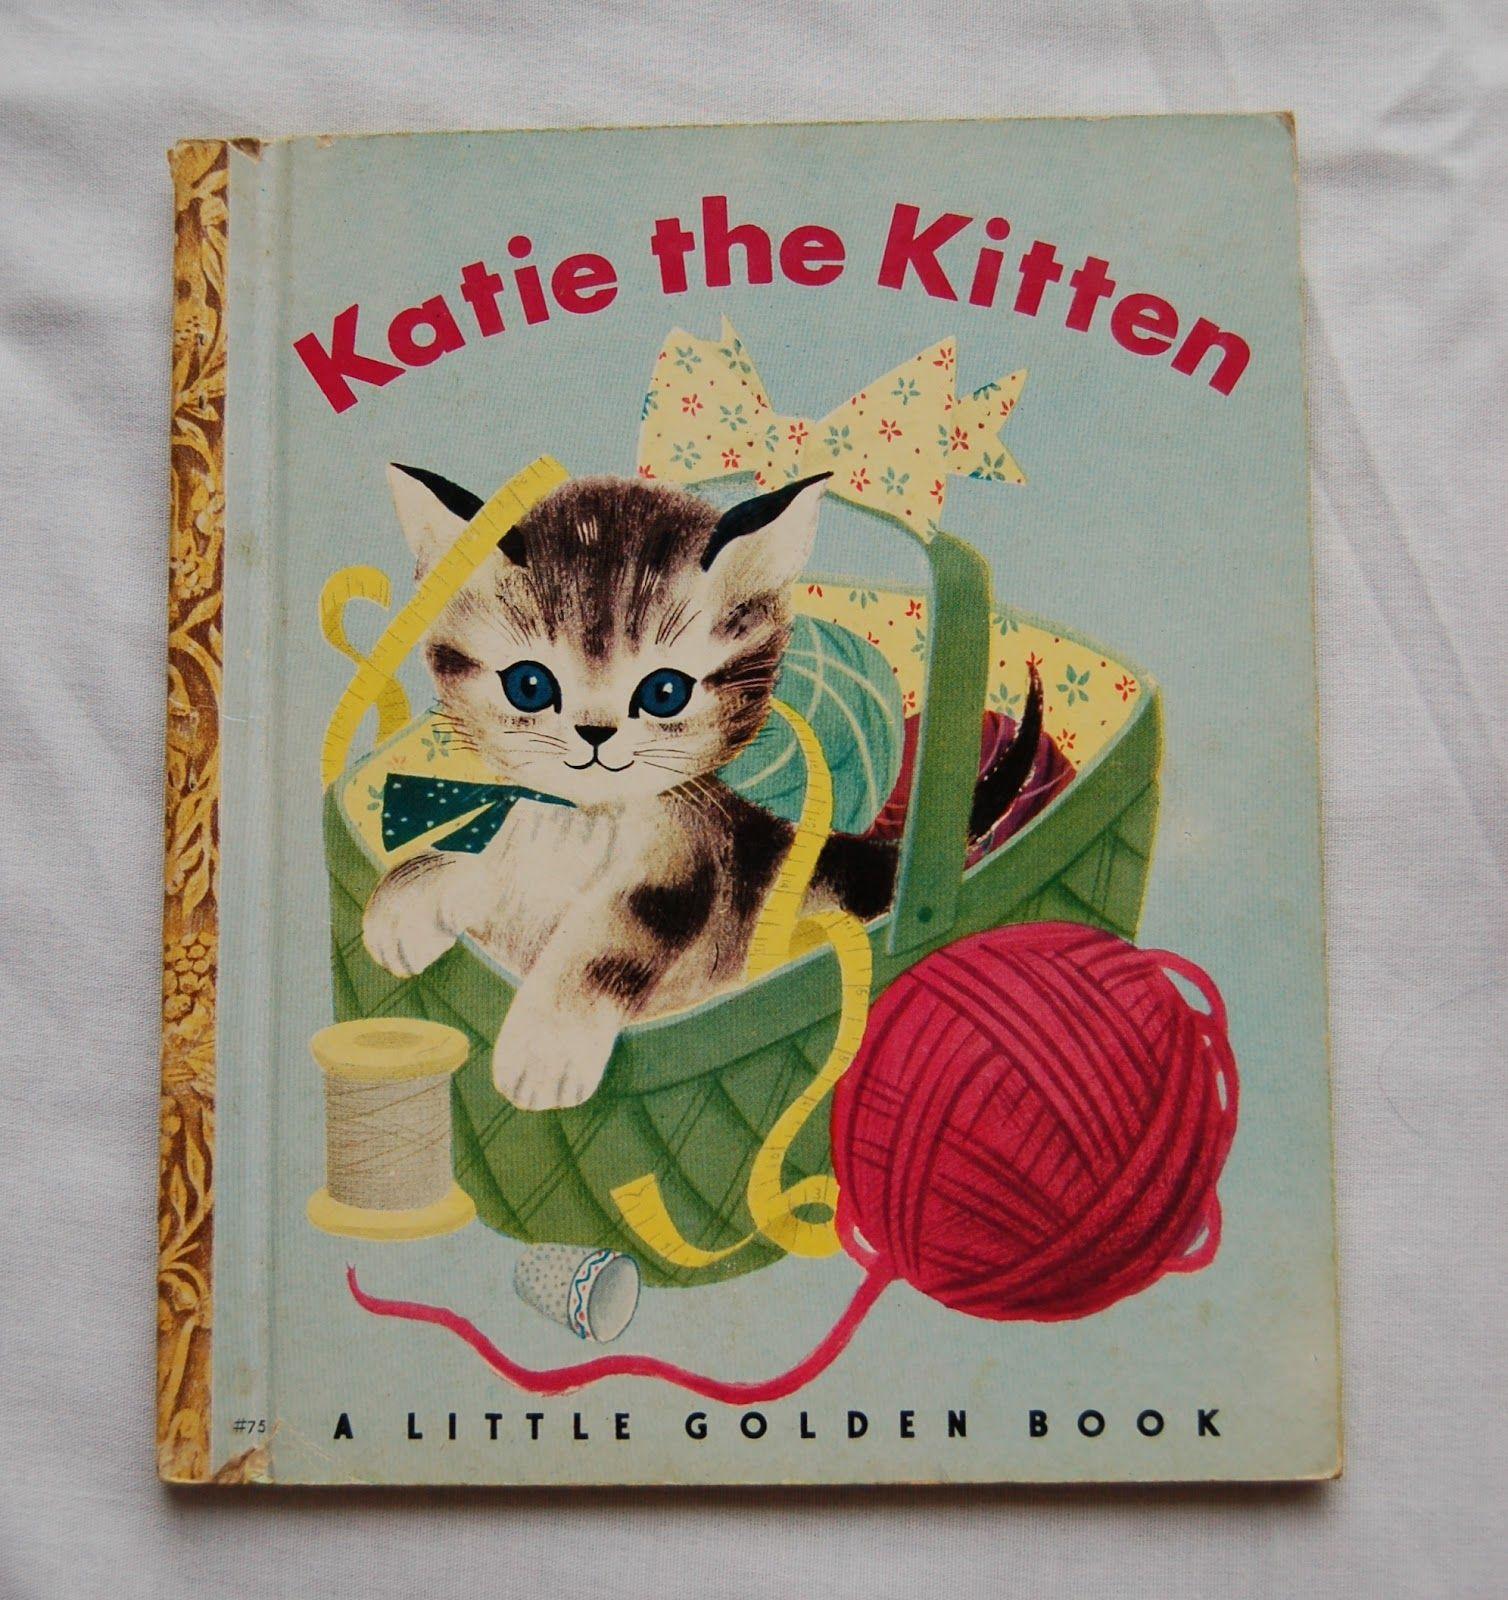 Katie The Kitten I Still Have This Book Little Golden Books Childrens Books Illustrations Vintage Books